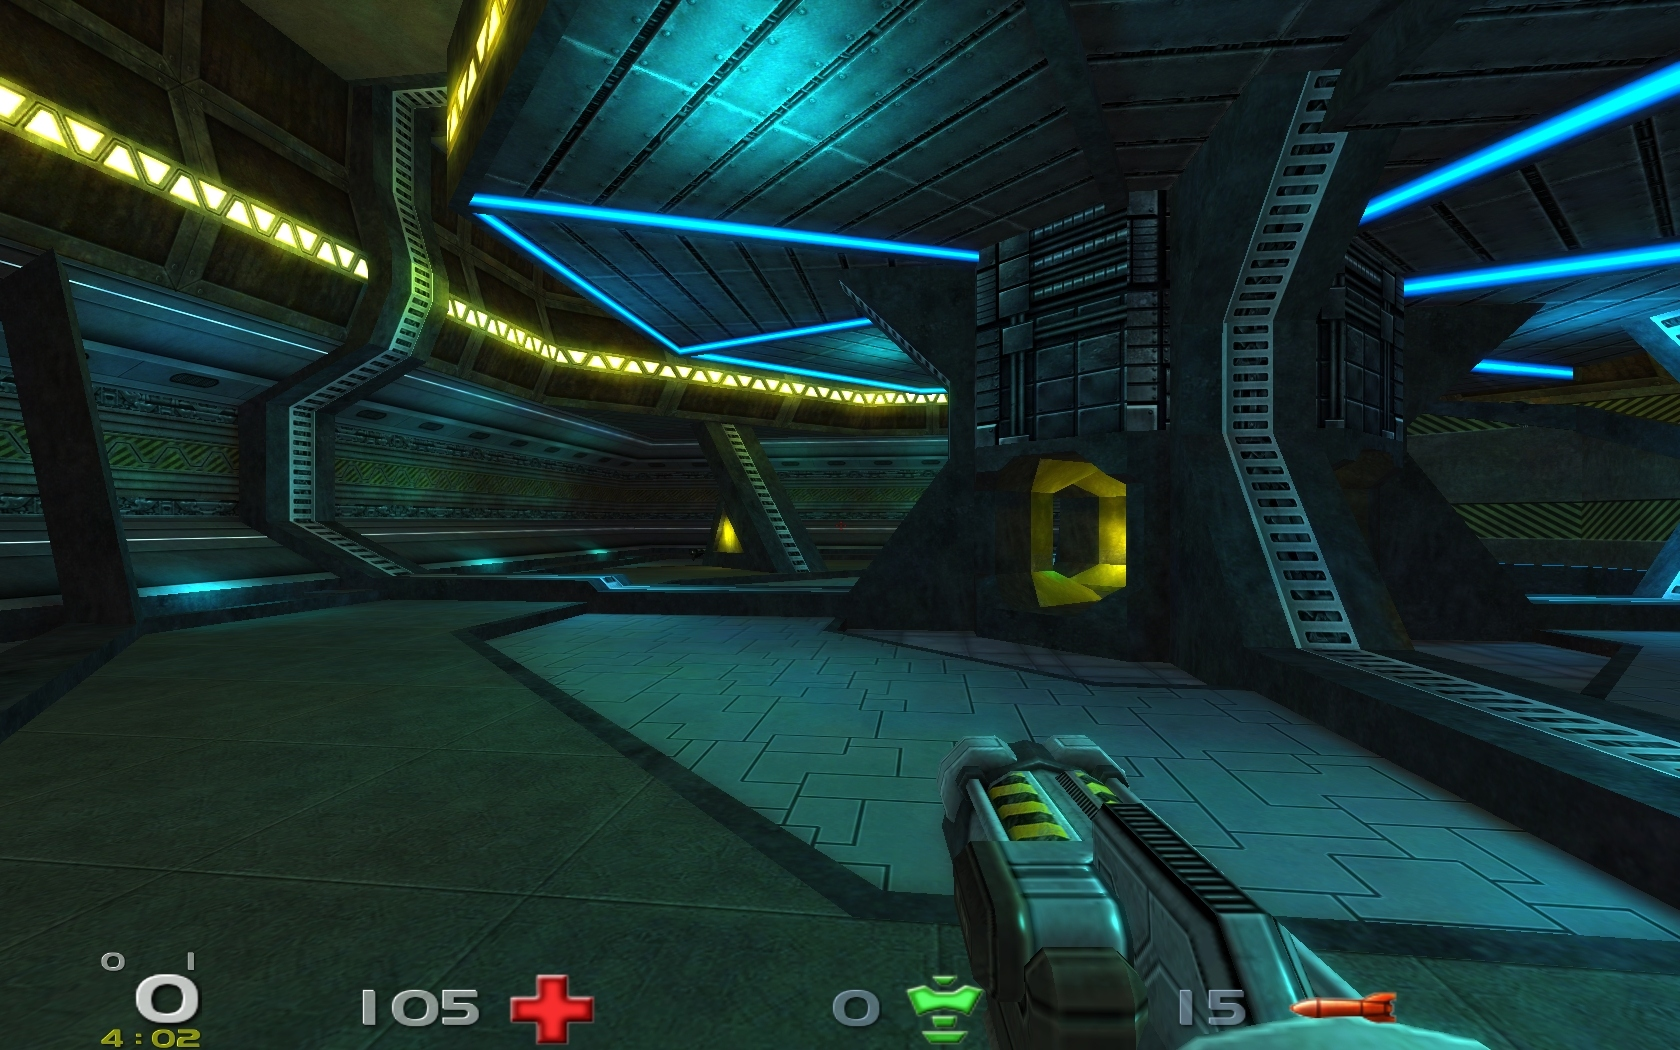 Онлайн игры стрелялки с улучшением стрелялки 1 на 1 онлайн